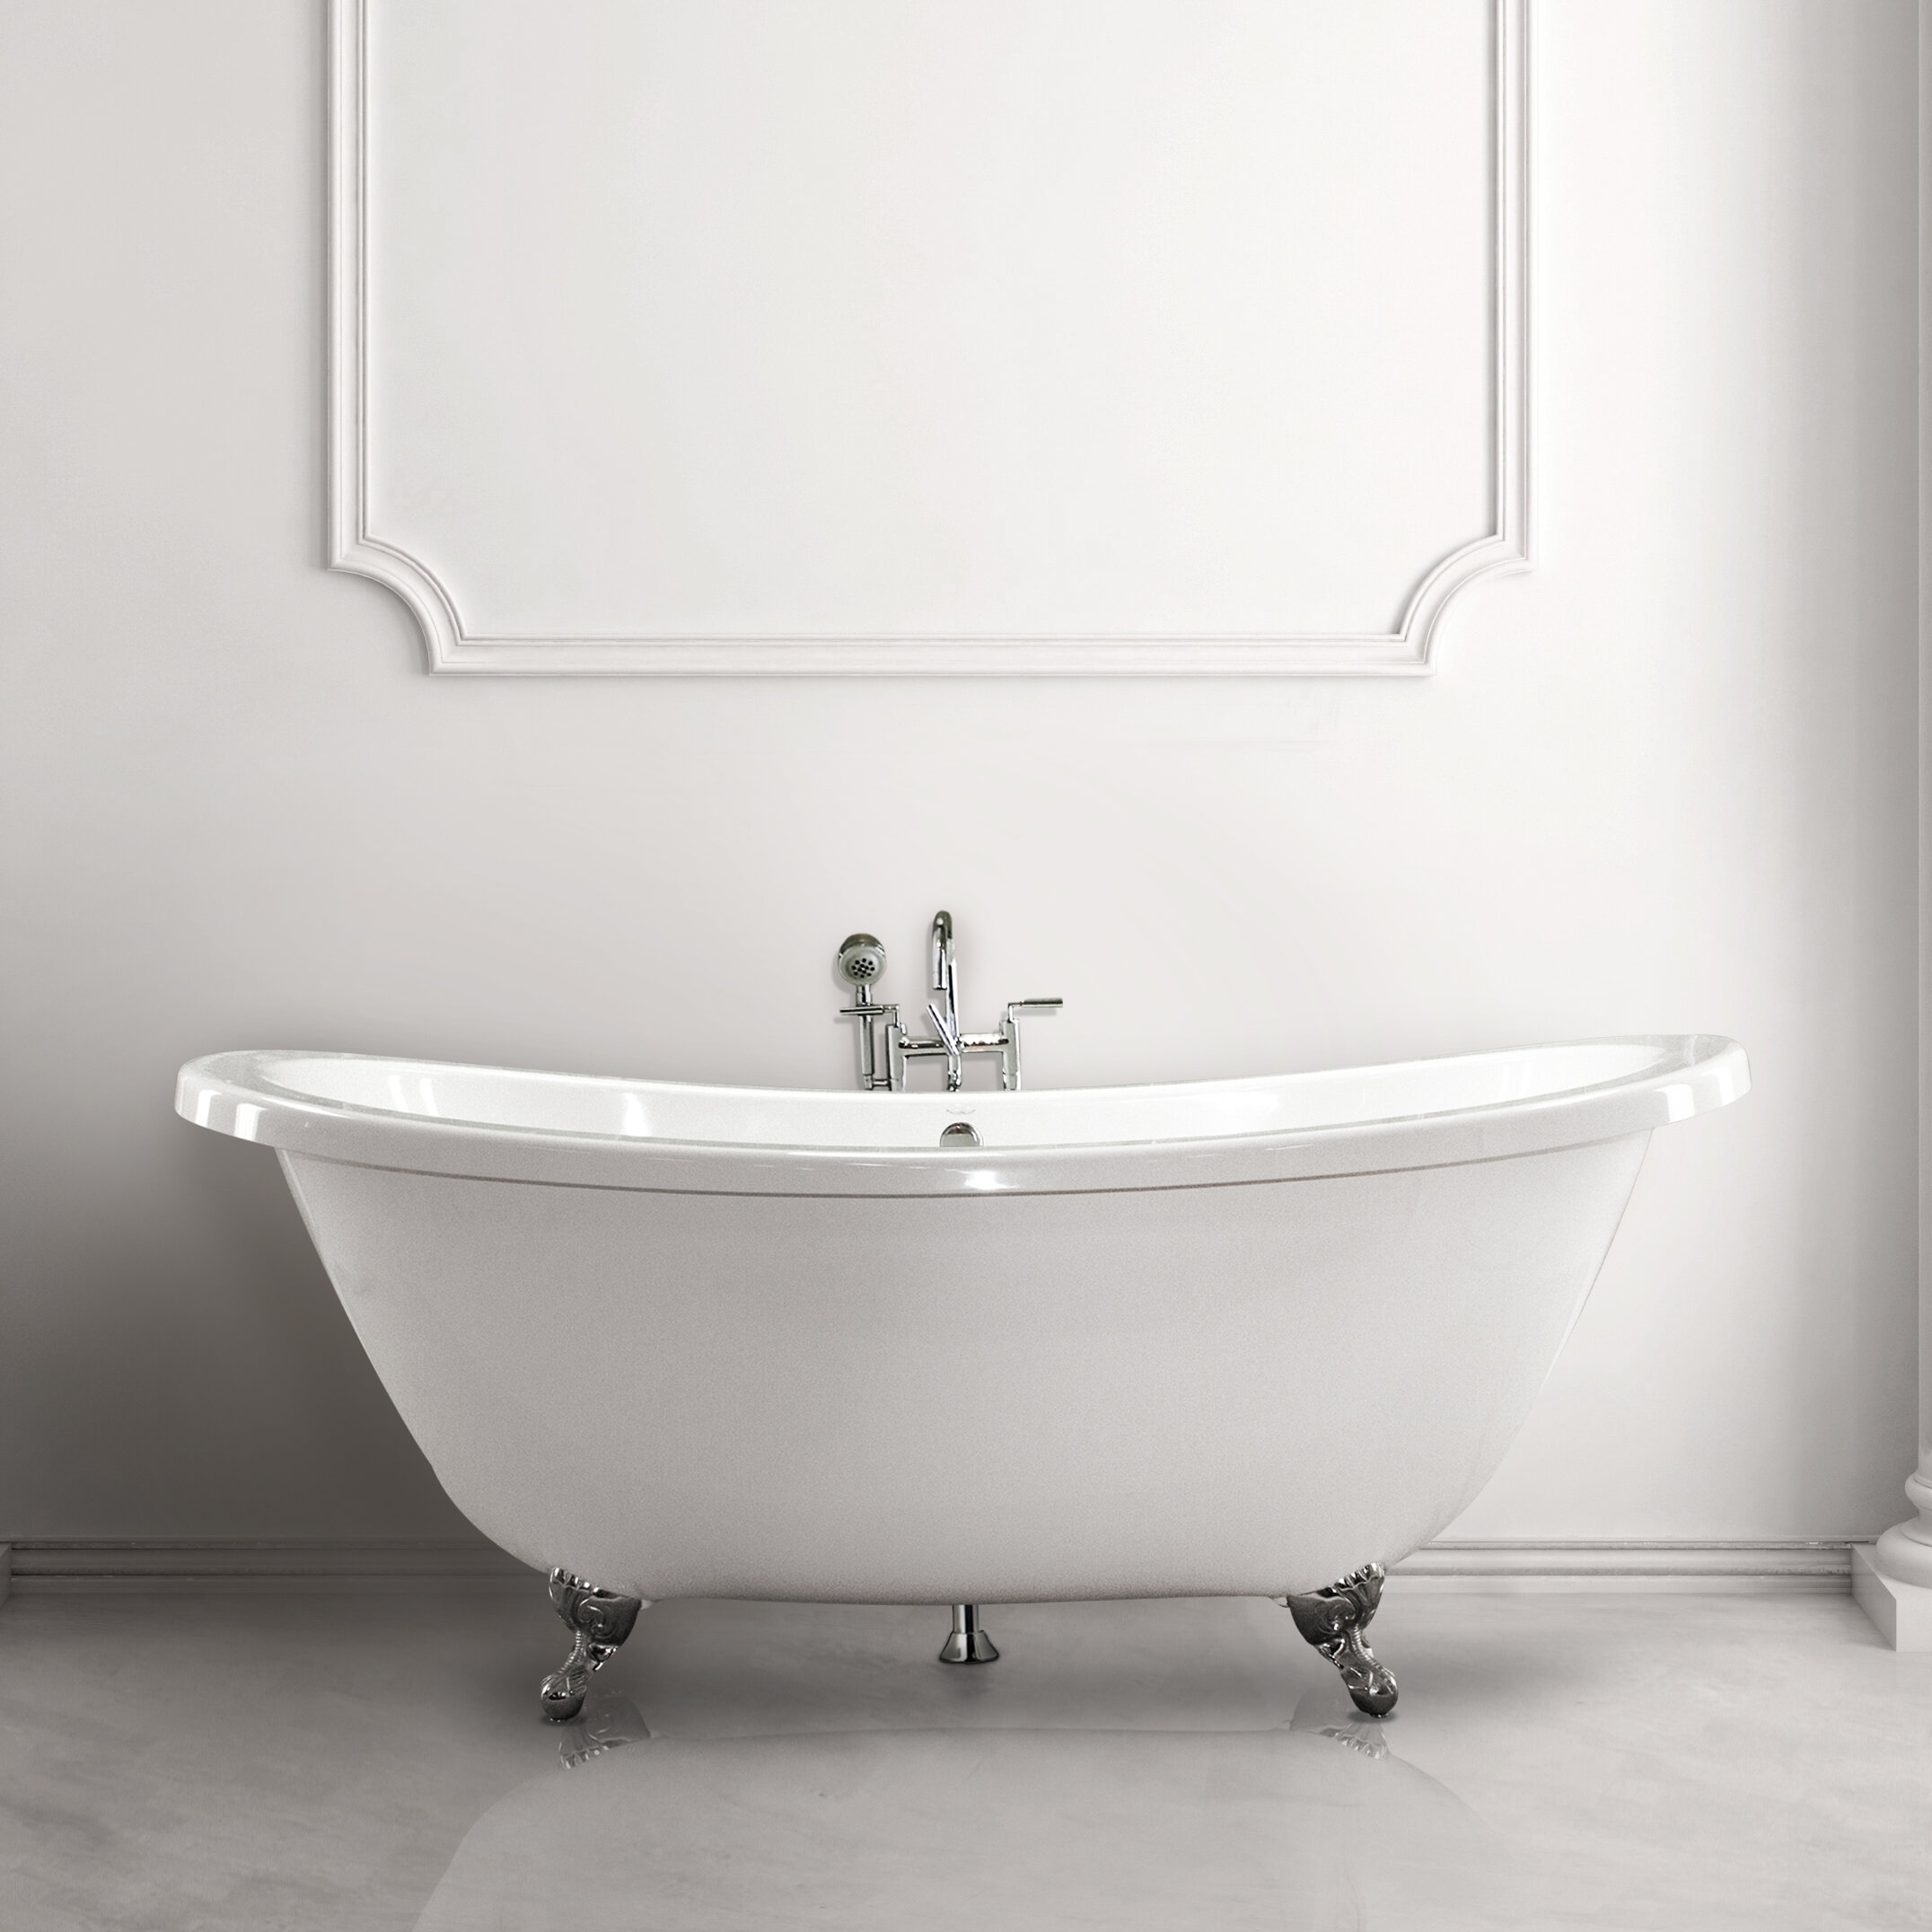 Andrea 72 X 38 Freestanding Soaking Bathtub